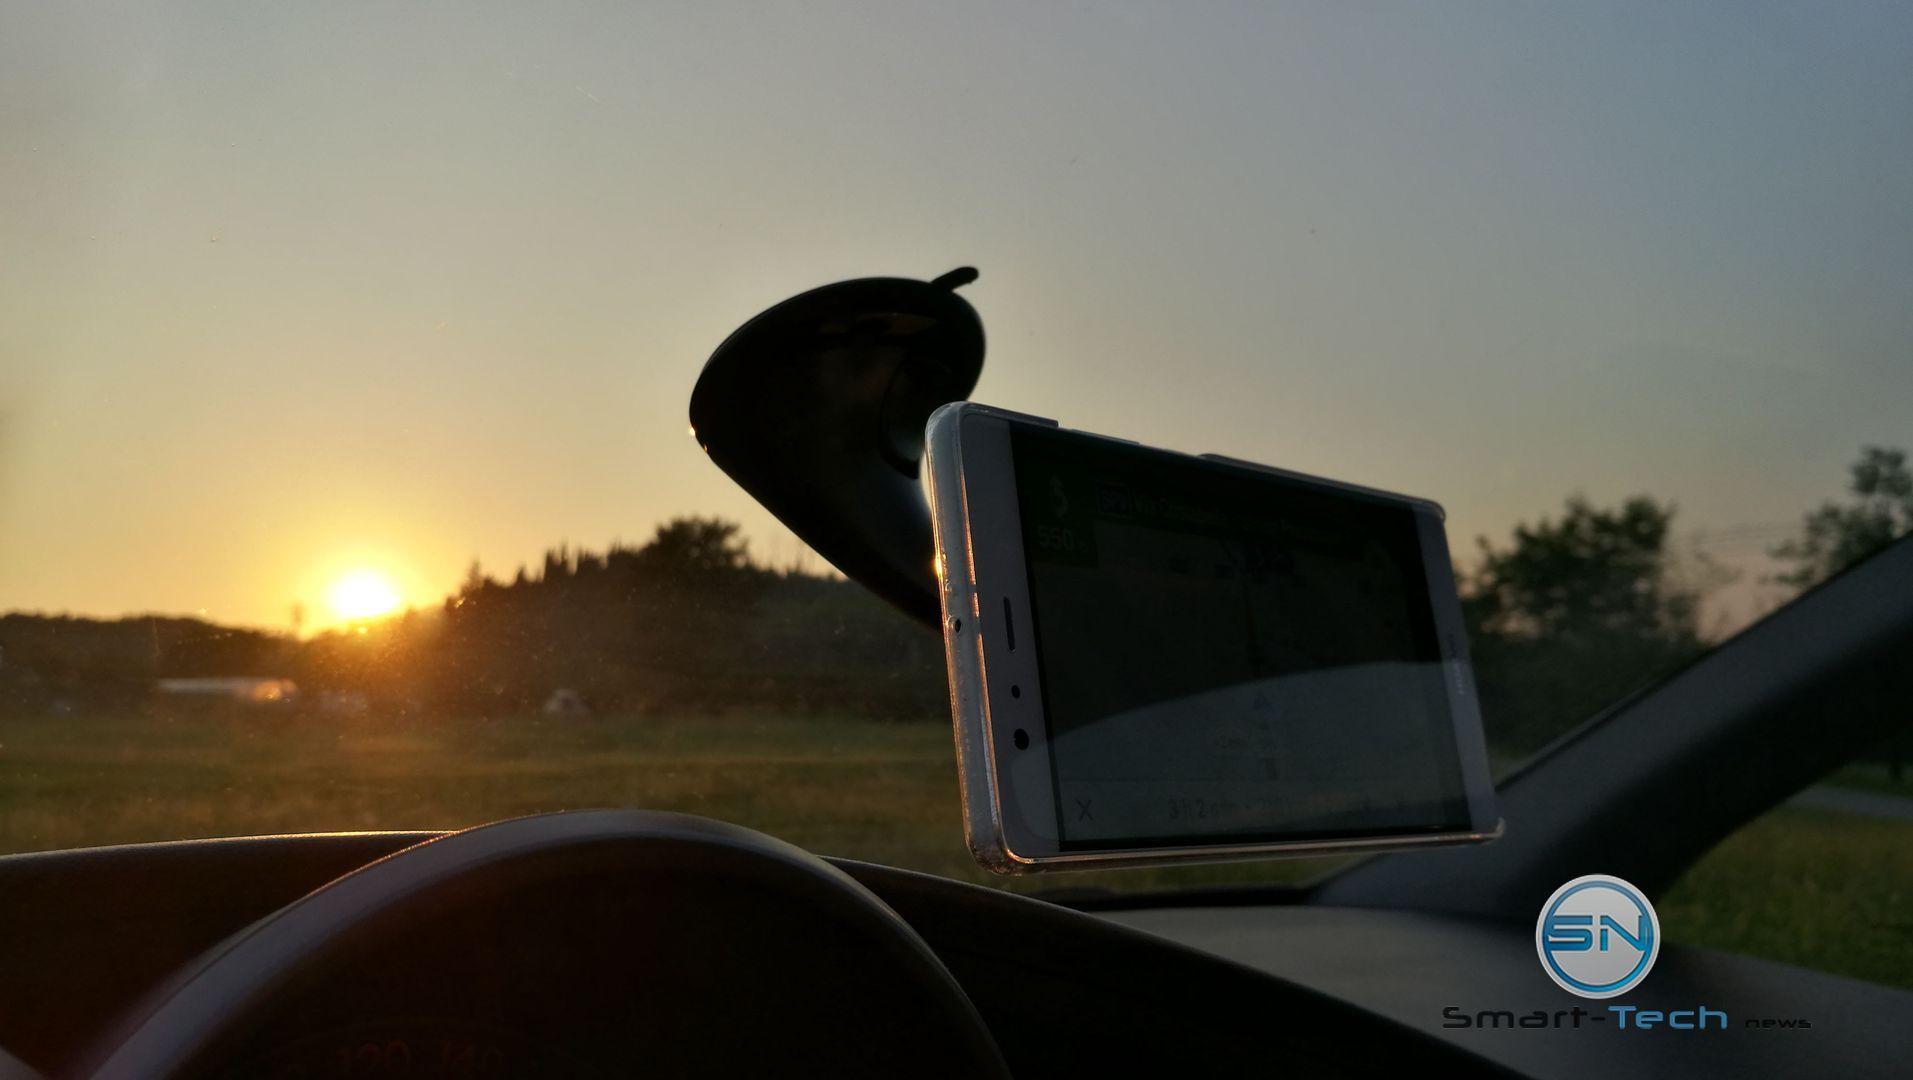 haelt-auch-am-feldweg-forever-moto-line-smartphone-kfz-halterung-smarttechnews